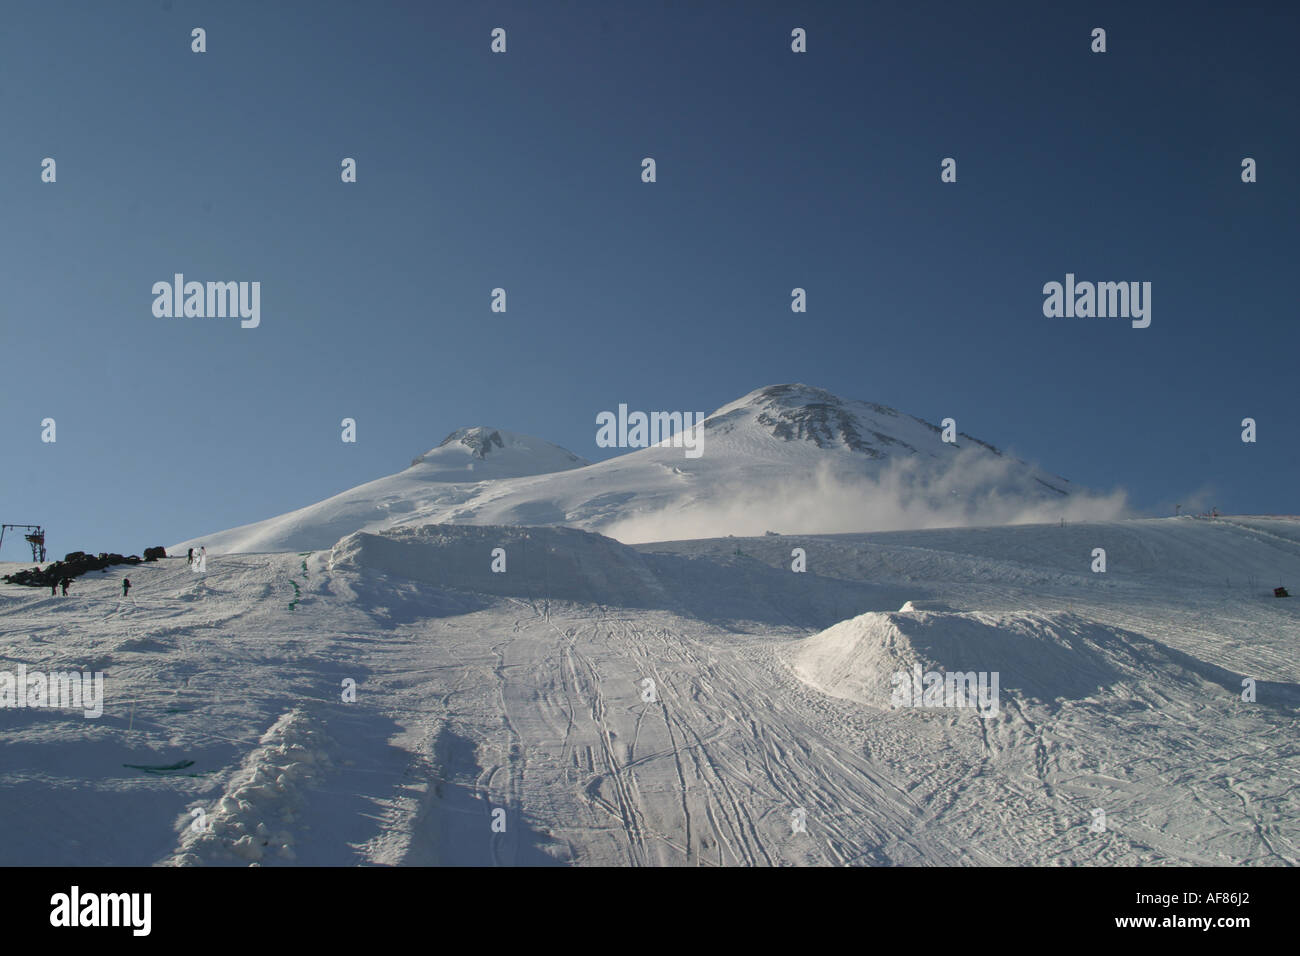 Mountains landscape 23 - Evening Elbrus in pure blue sky and snowboard big-airs, Caucasus, Elbrus region, Kabardino-Balkari - Stock Image